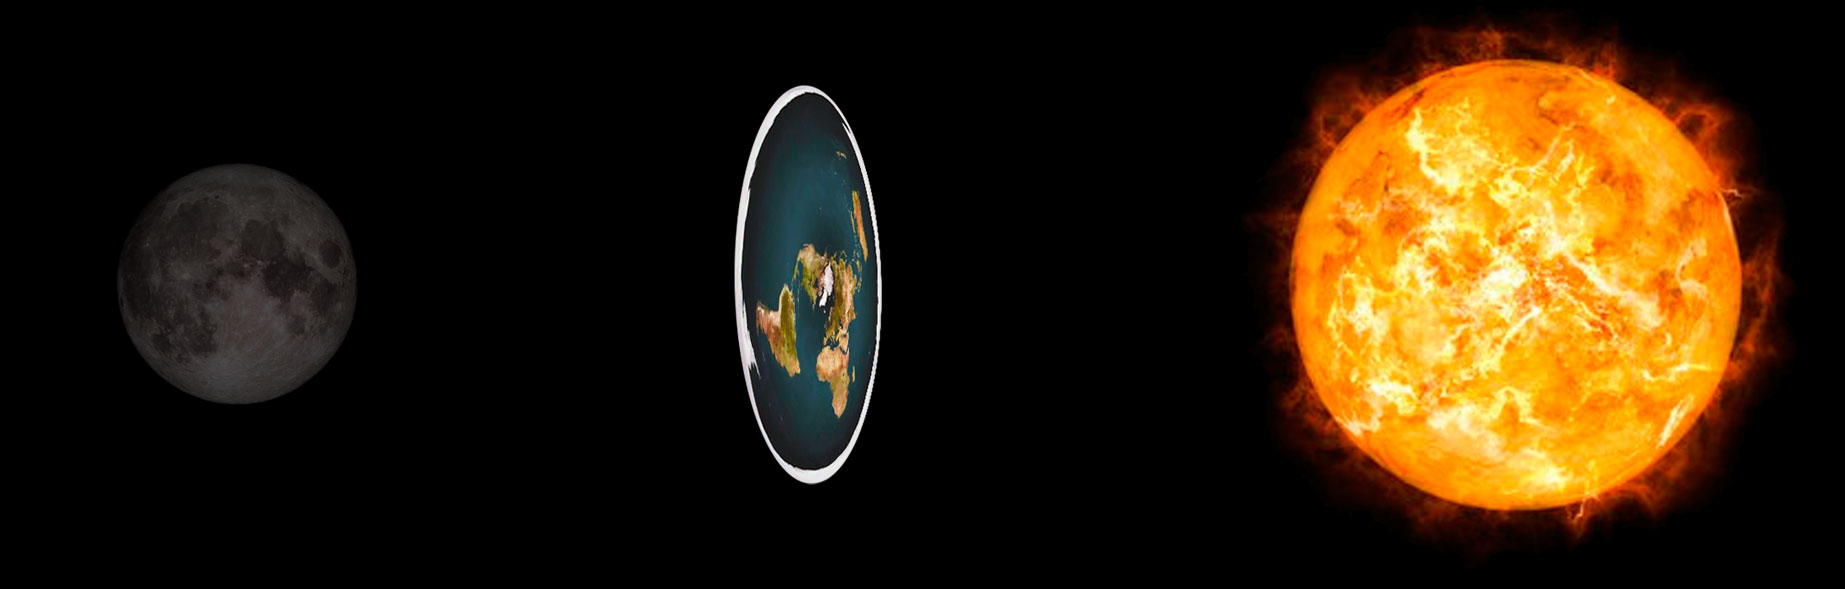 Perspectiva de un eclipse lunar